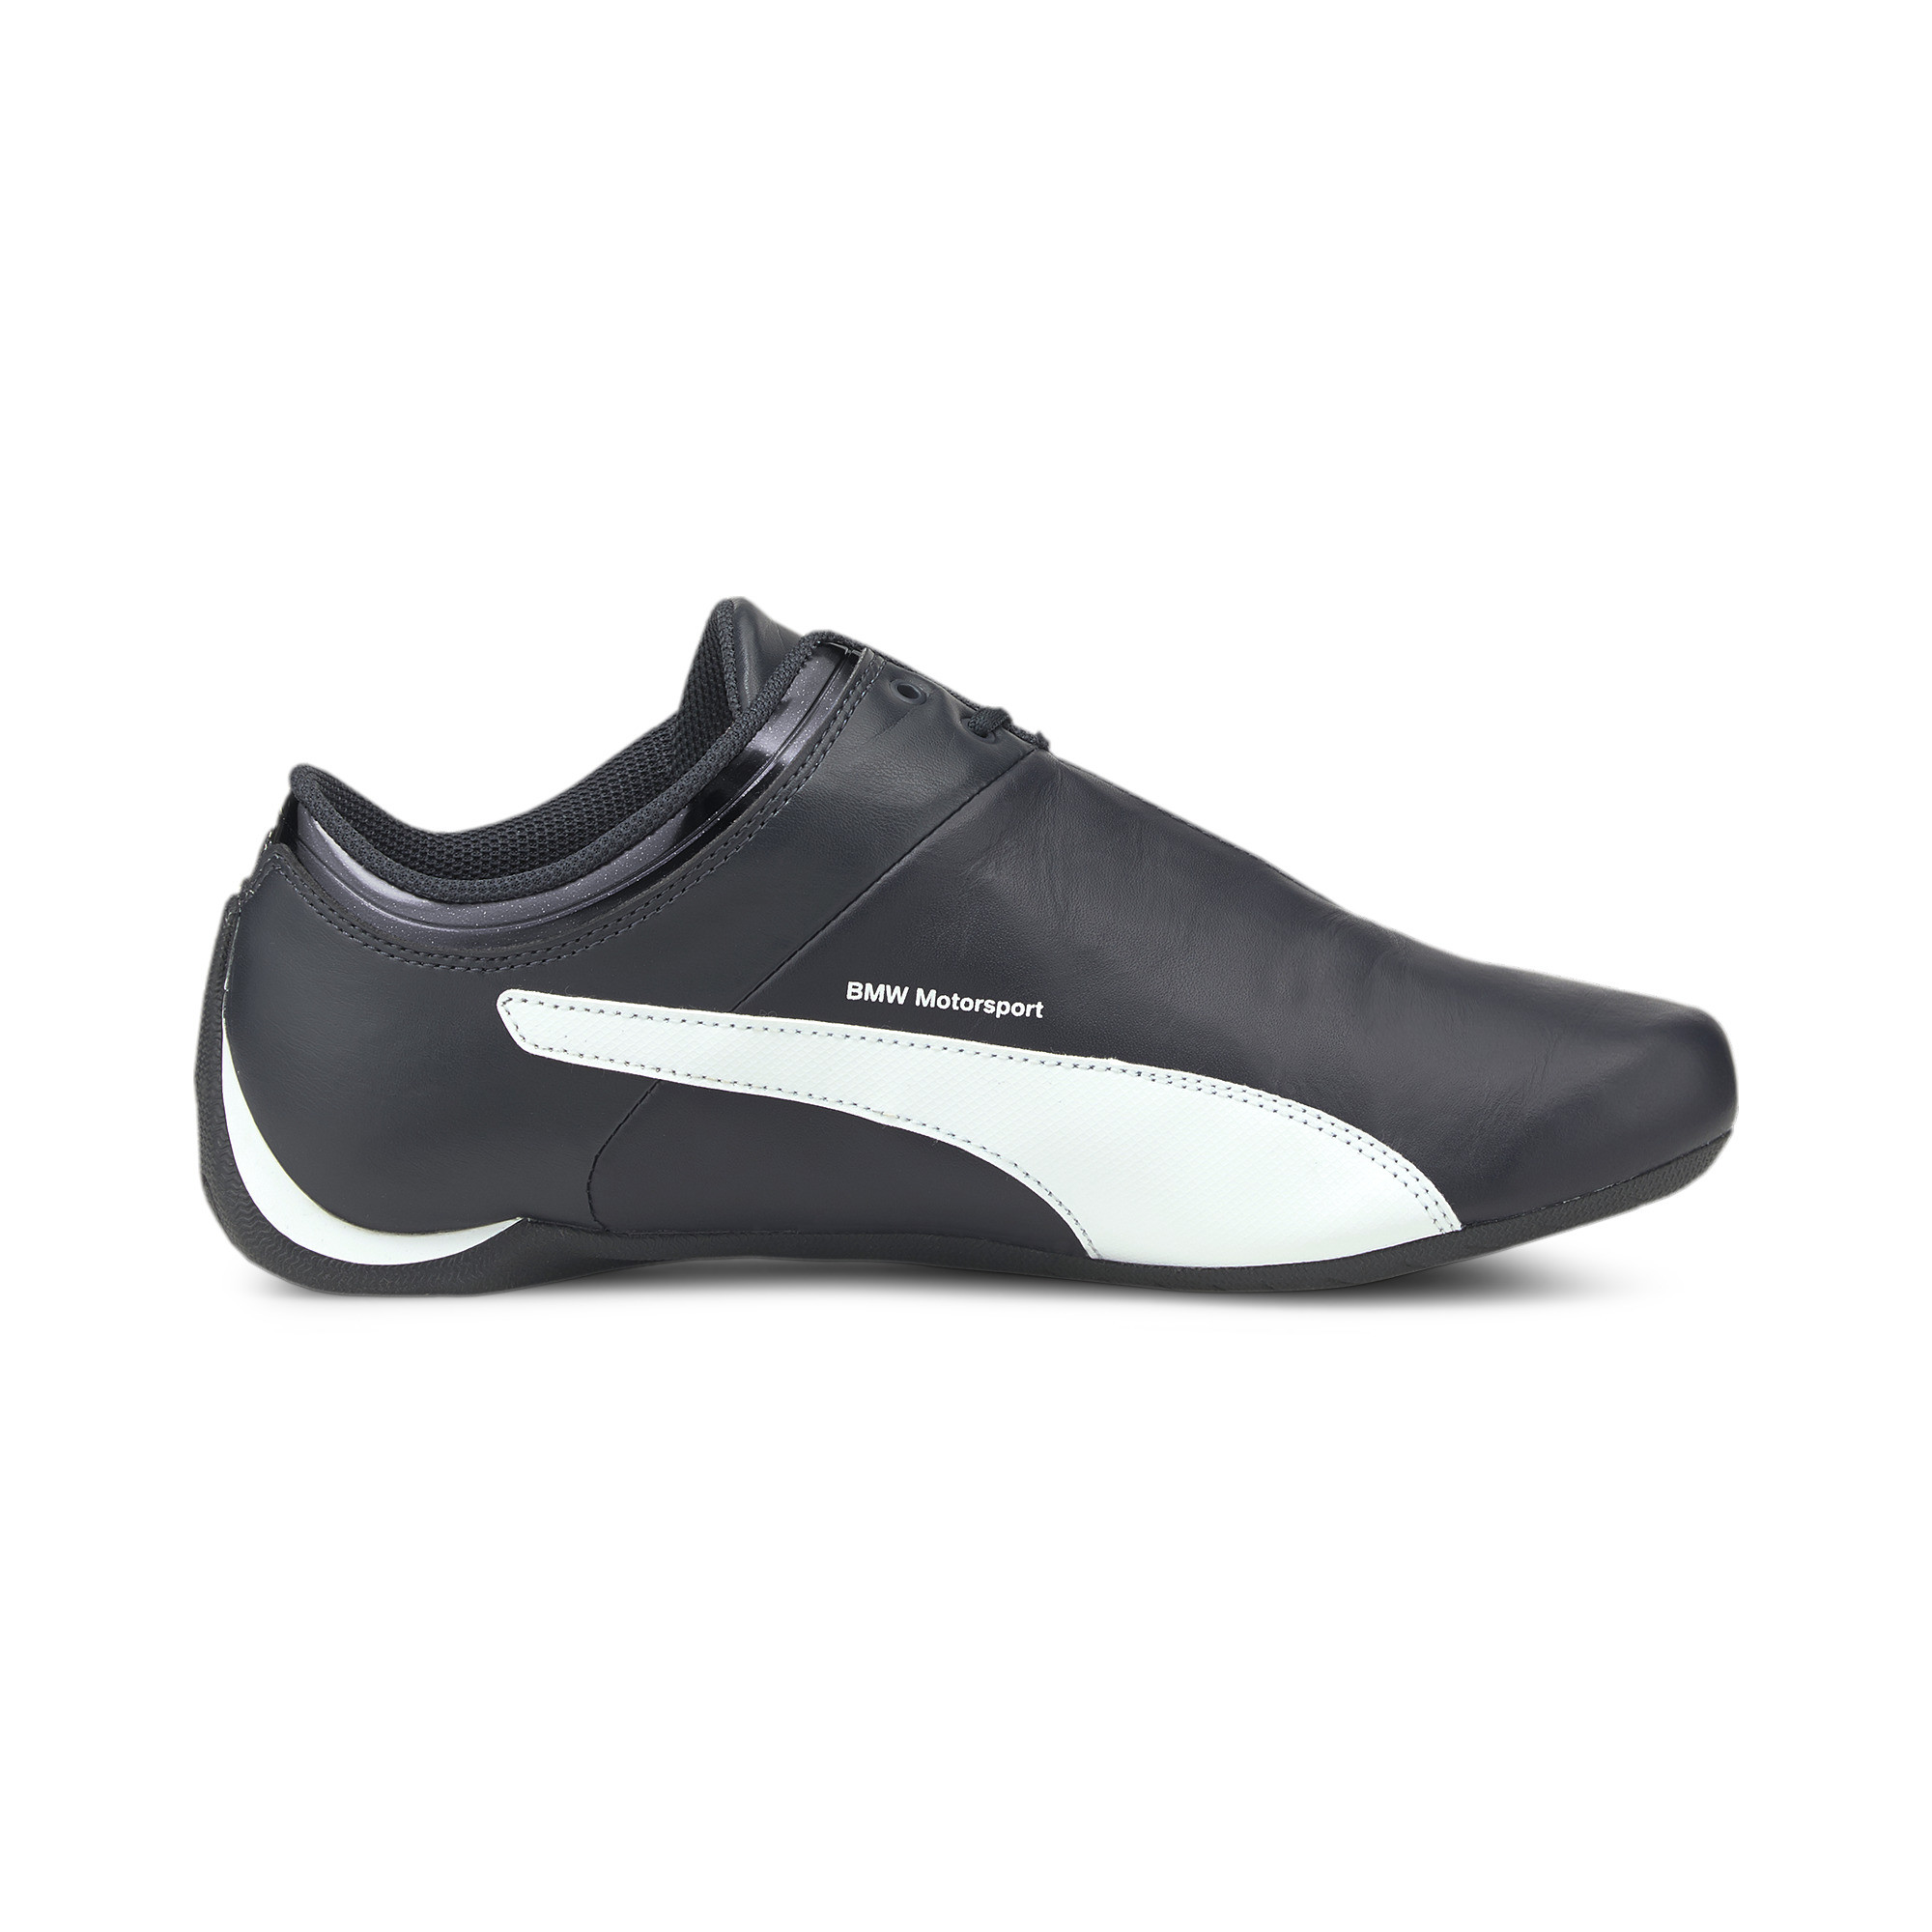 PUMA-BMW-Motorsport-Future-Cat-Sneaker-Maenner-Schuhe-Neu Indexbild 18